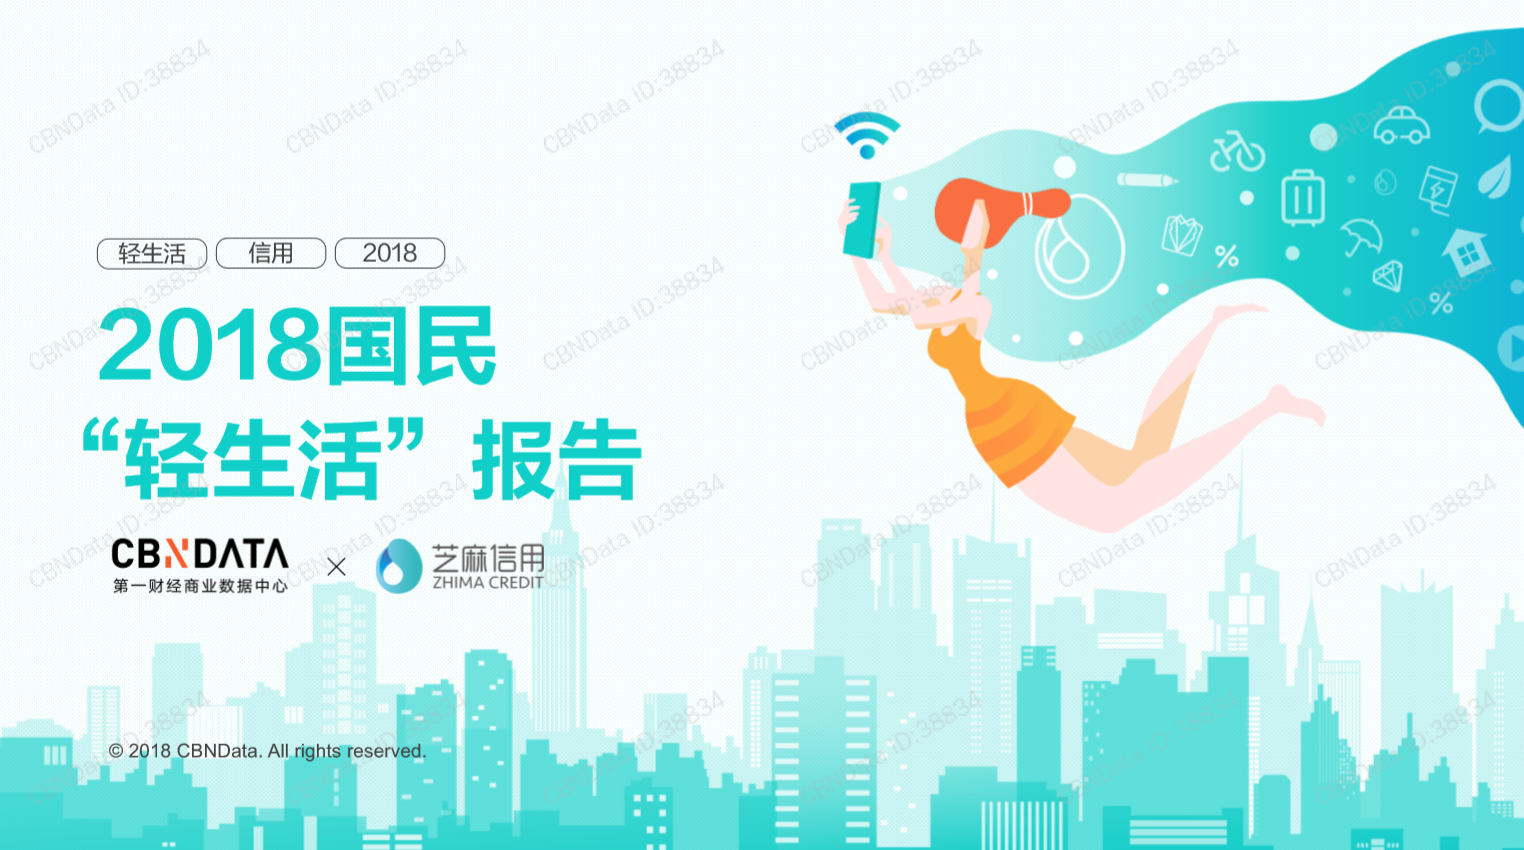 CBNData &芝麻信用:2018 国民「轻生活」报告